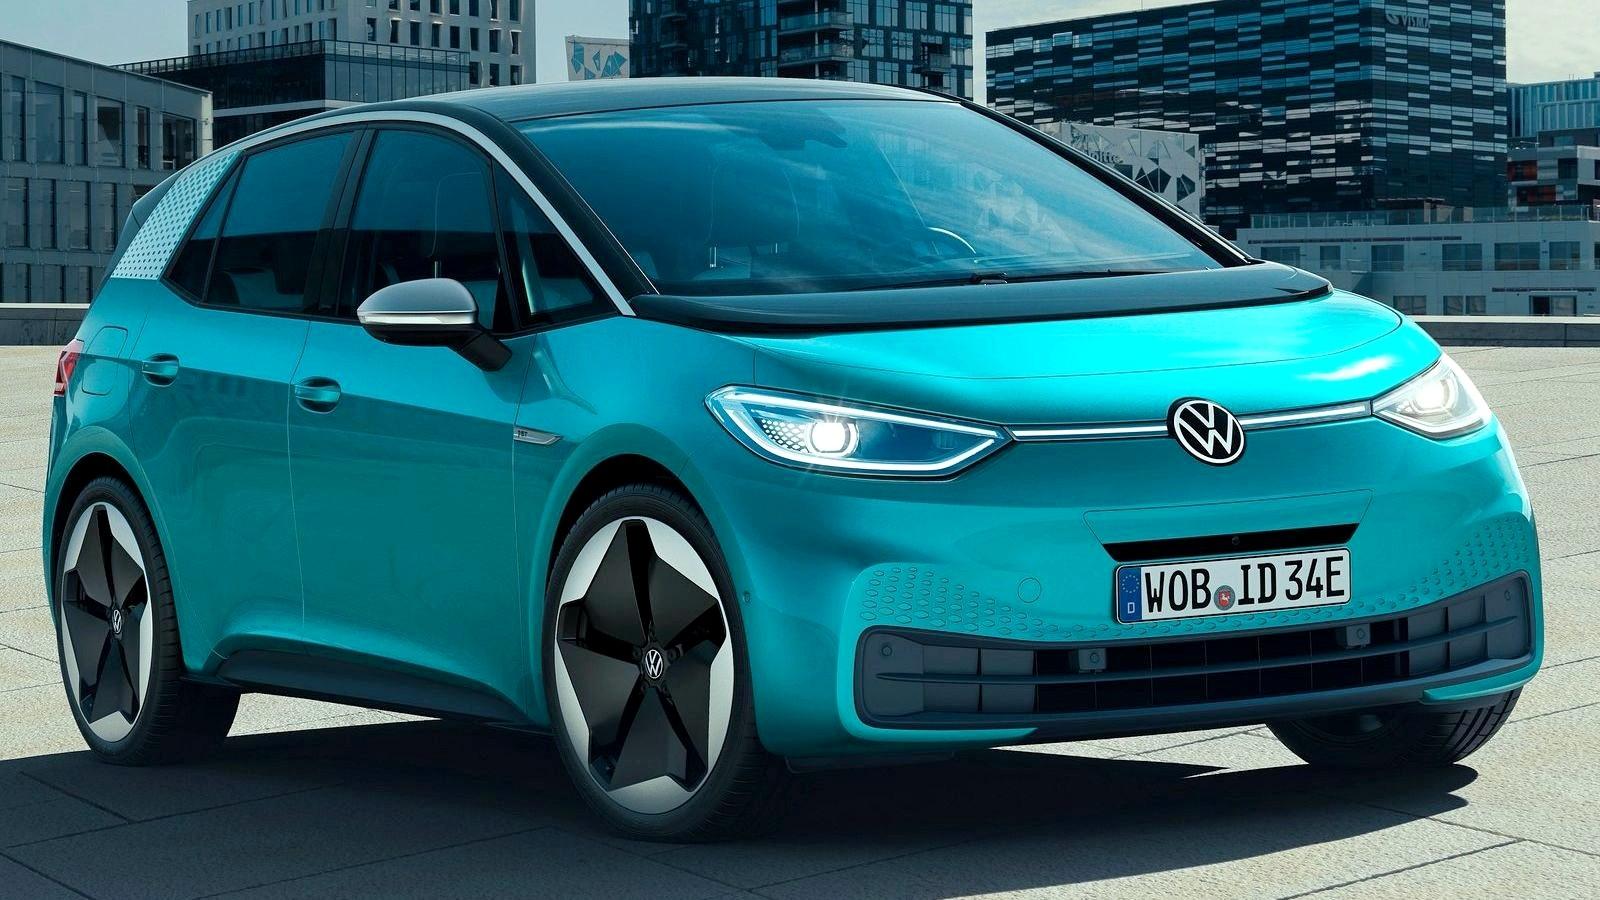 300 «лошадей» и задний привод: Volkswagen готовит хот-хэтч на базе ID.3